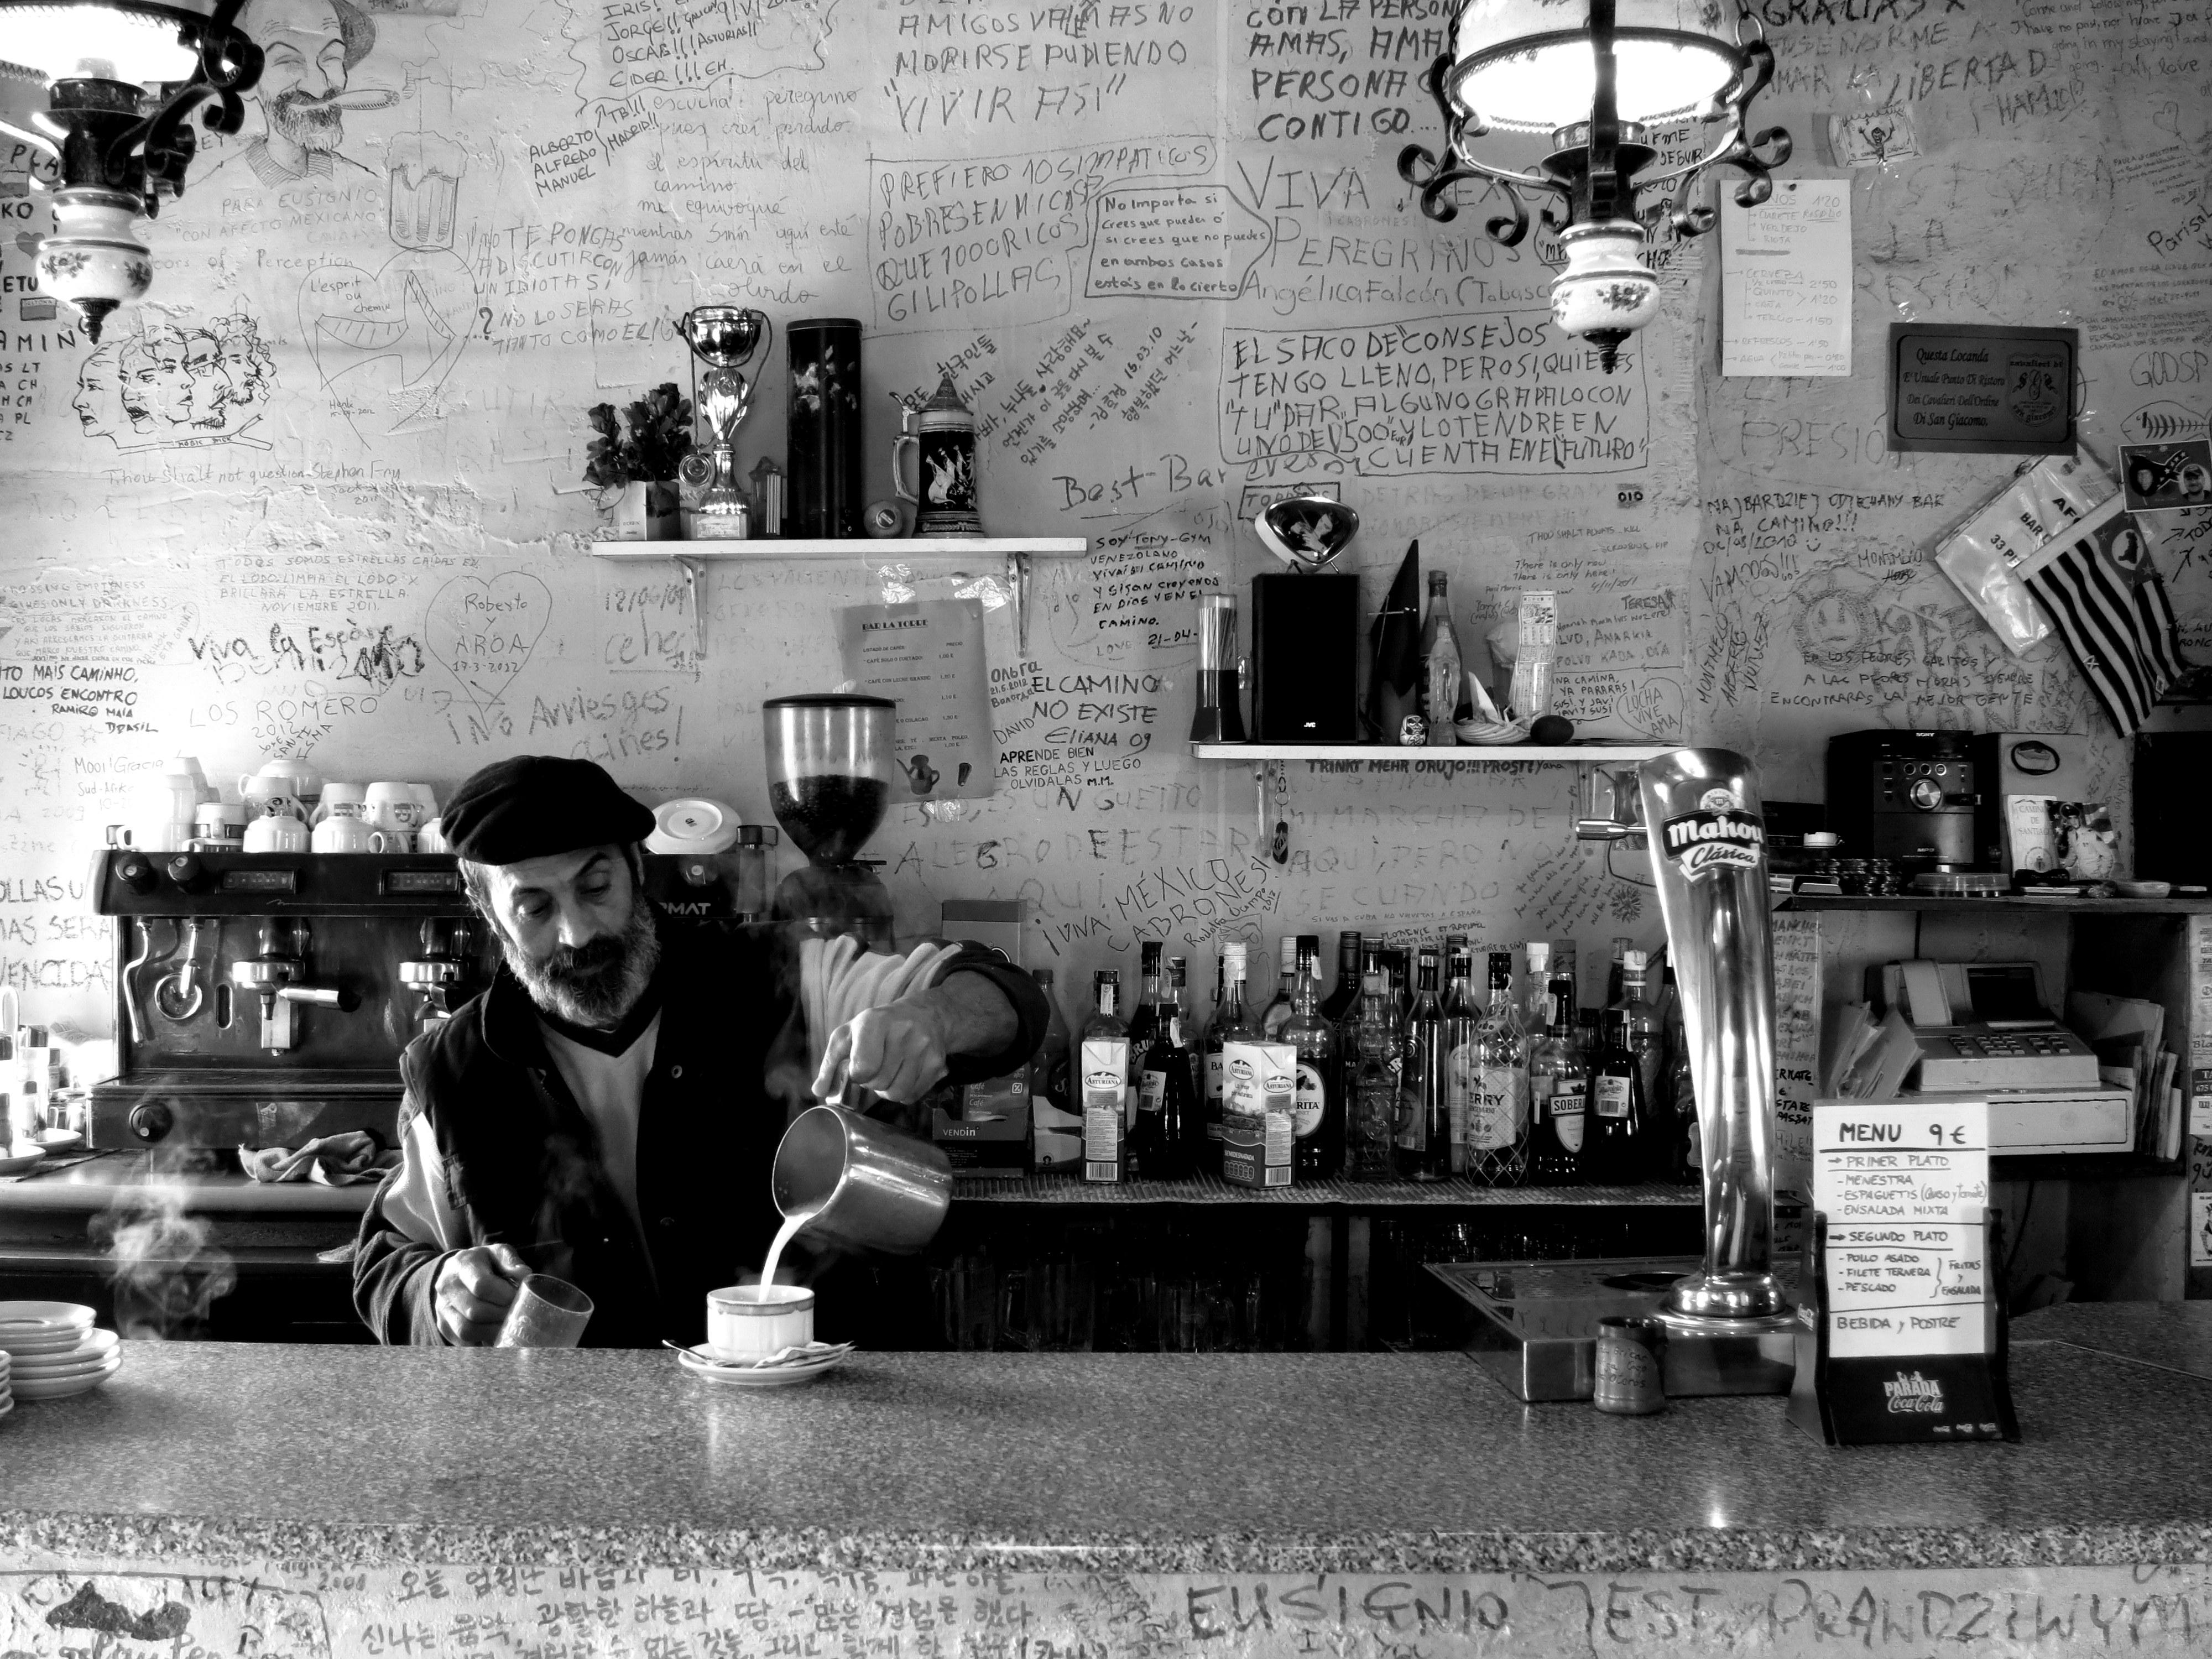 cafe con leche , Spain